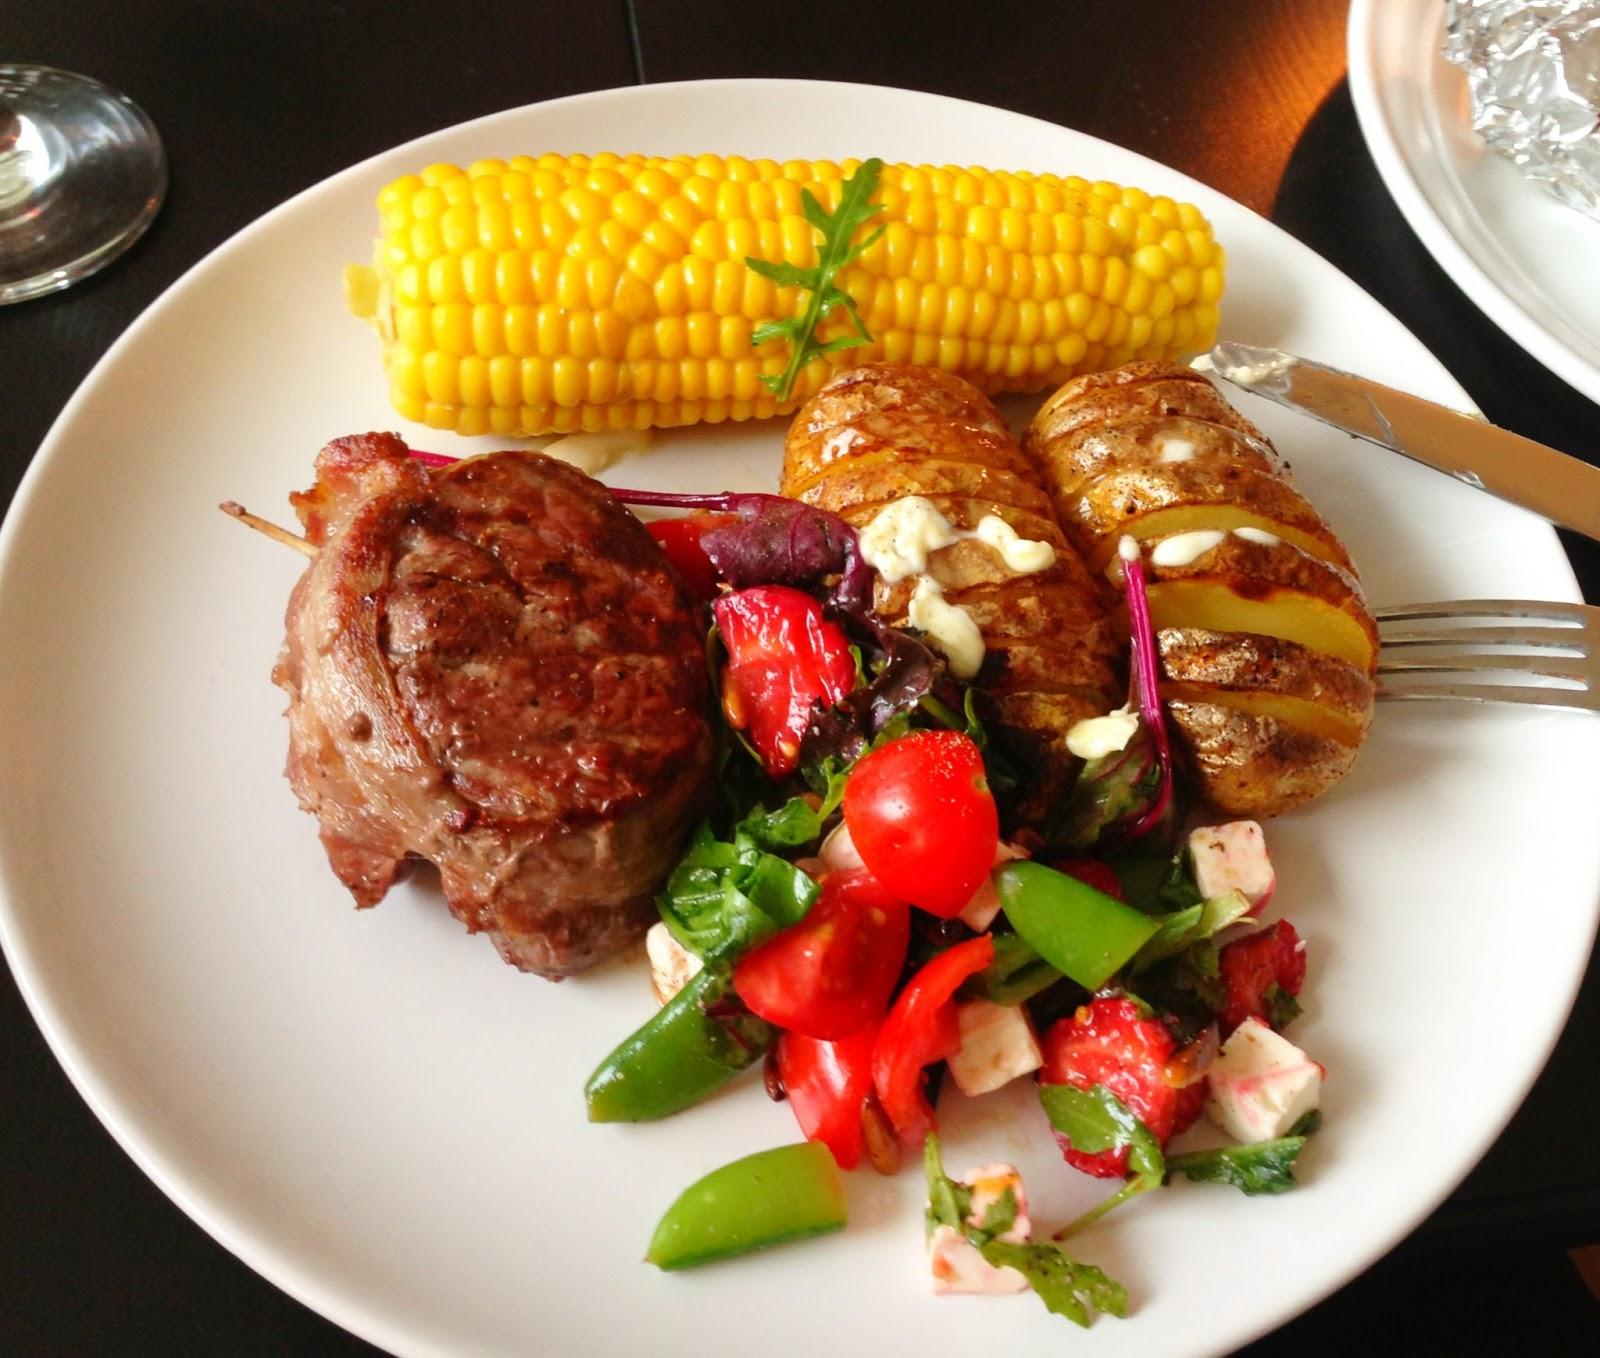 grill, sommer, oksemedaljon, majskolbe, majs, salat, fete, jordbær, kartofler, bagte kartofler, tomat, agurk, tzatziki,